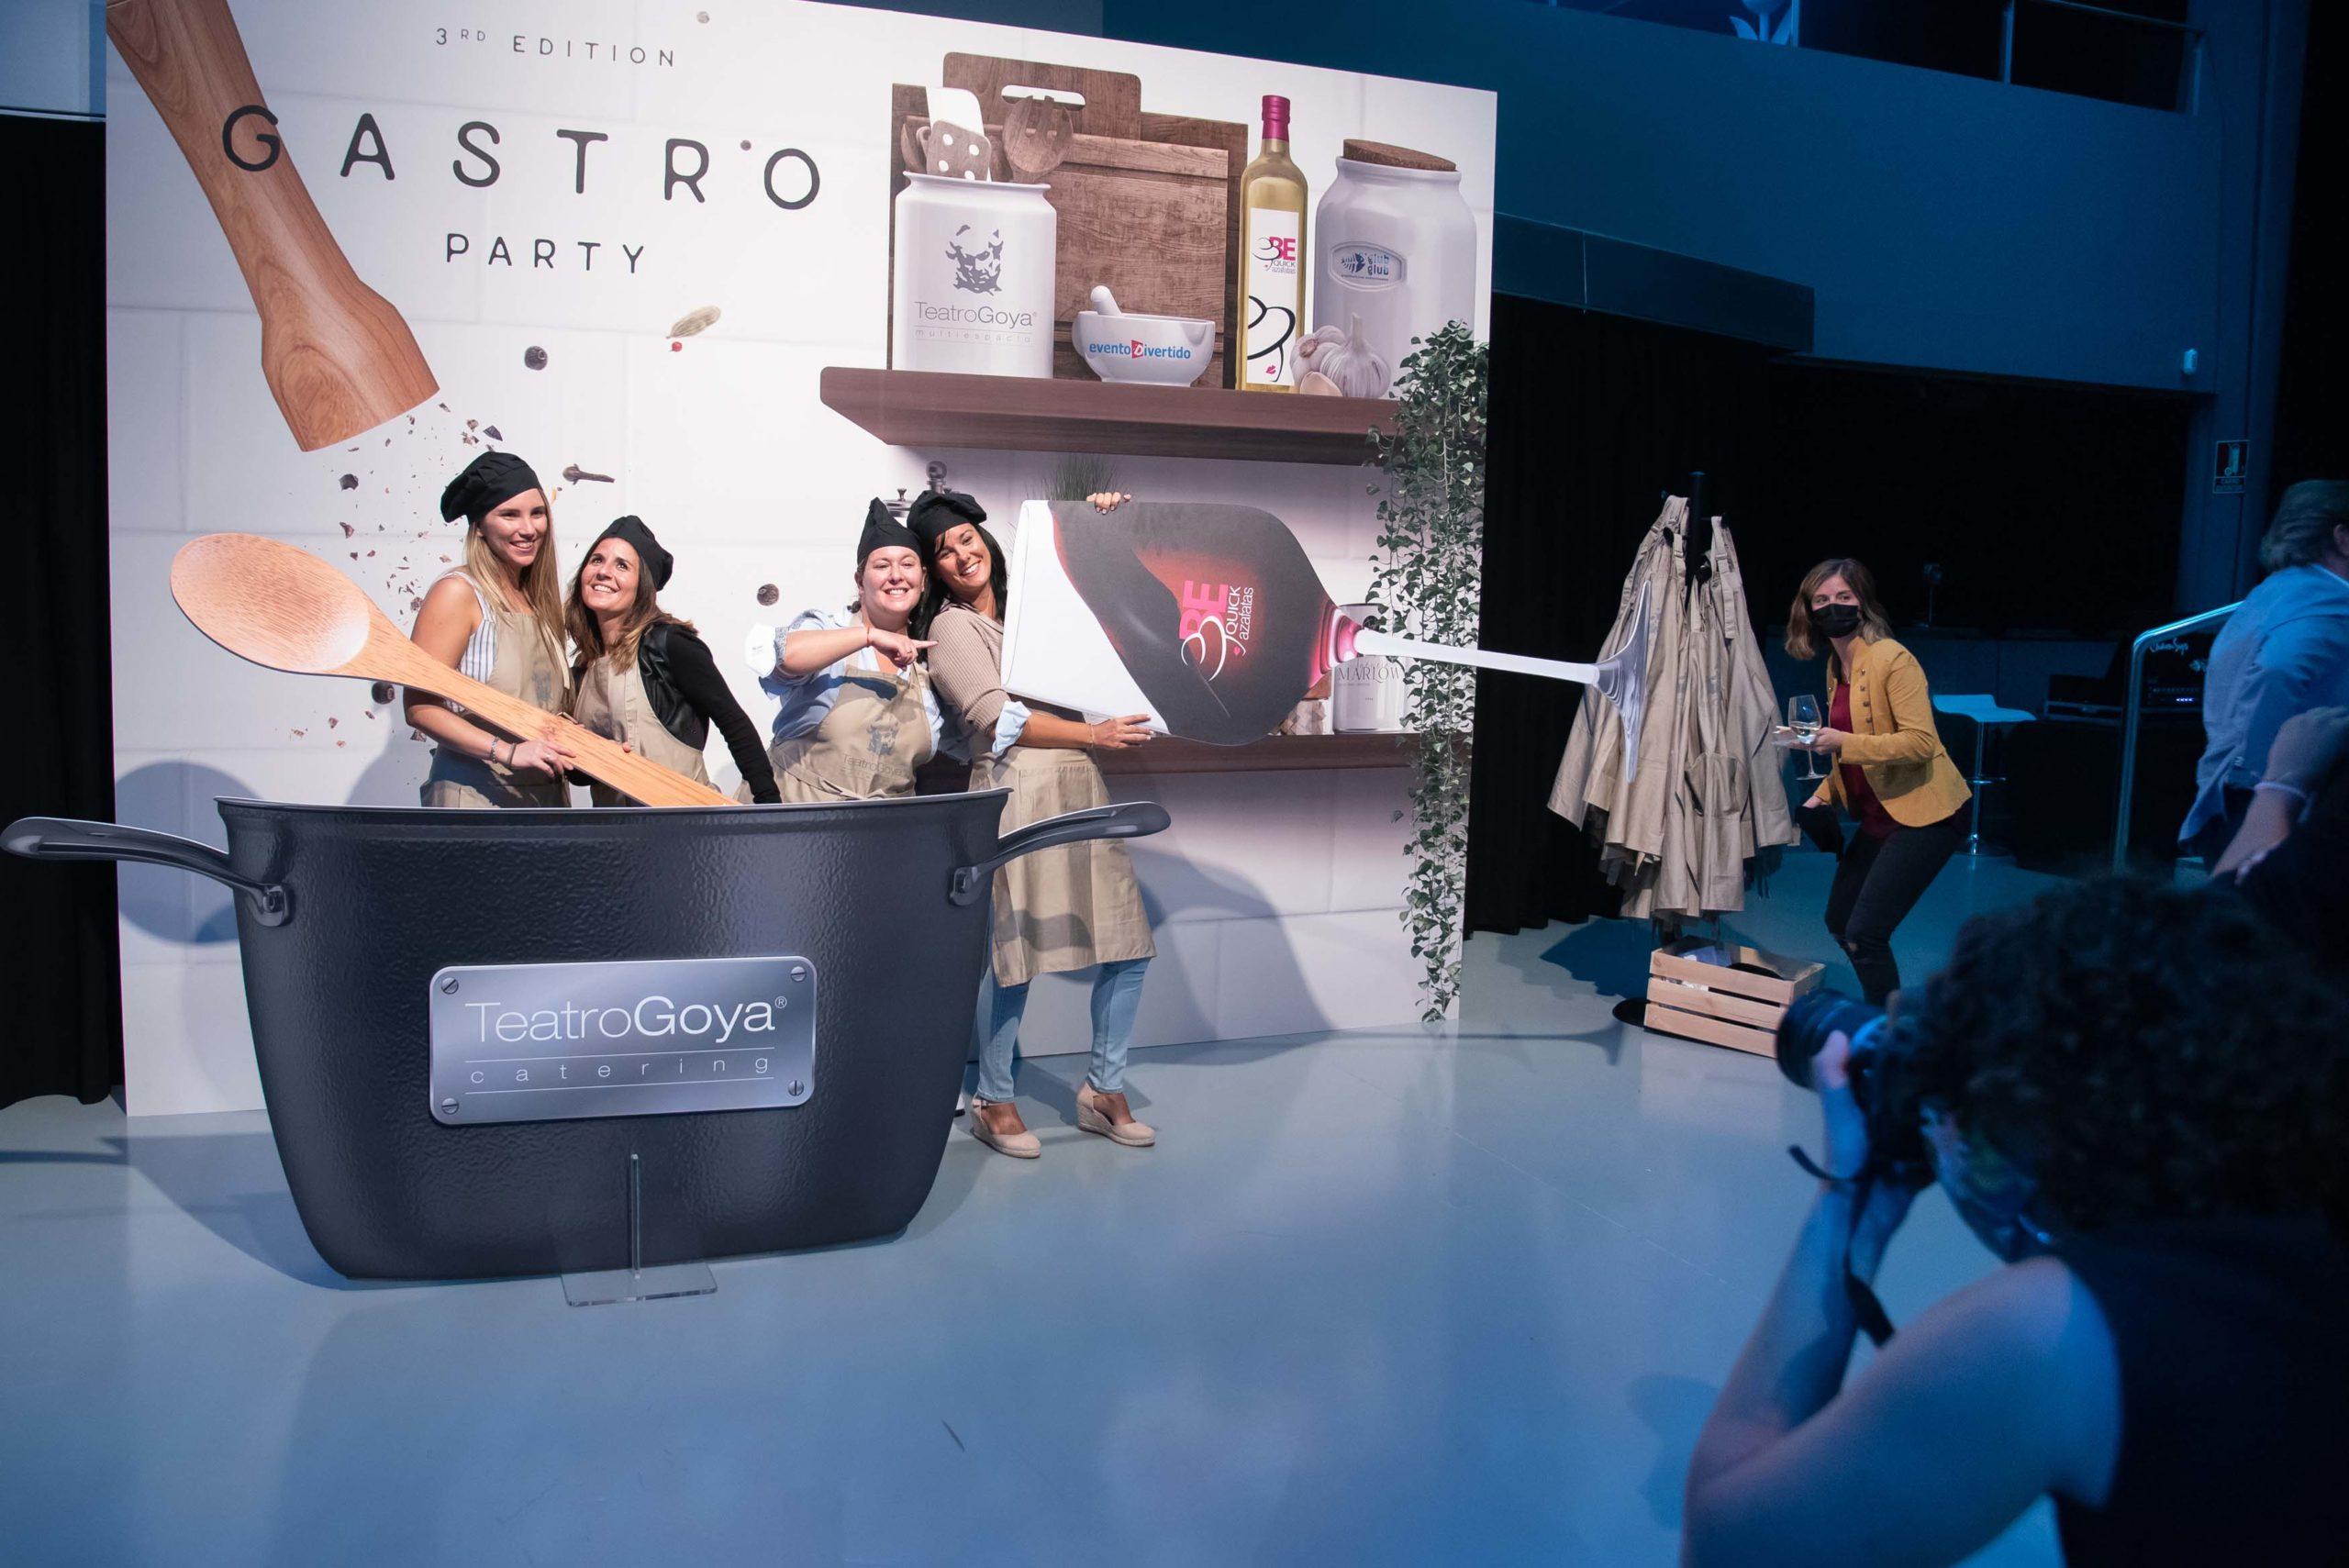 02-TeatroGoya-GastroParty-Asistentes-138